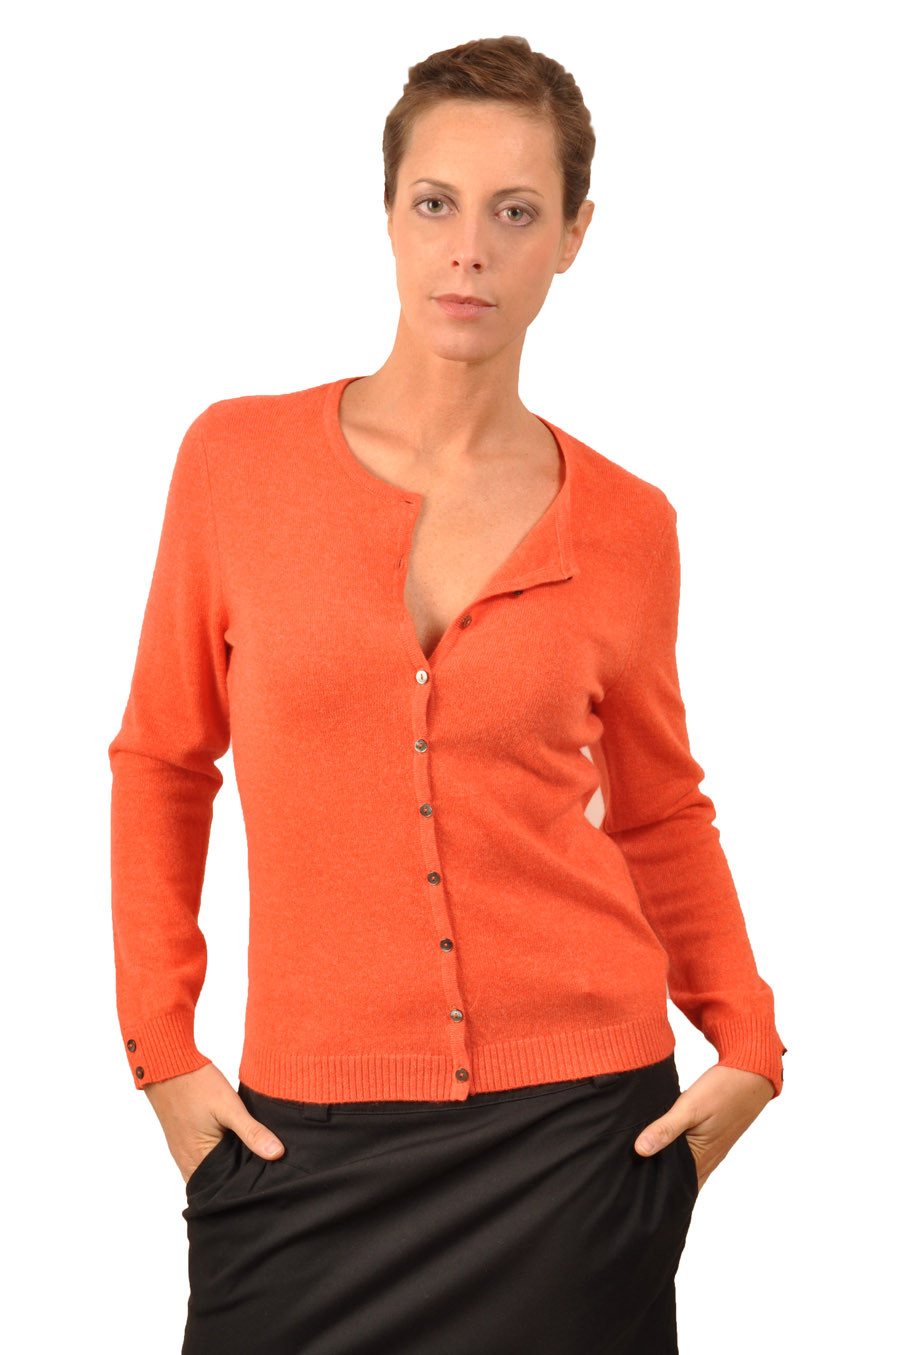 Cardigan cachemire femme ANGEL orange